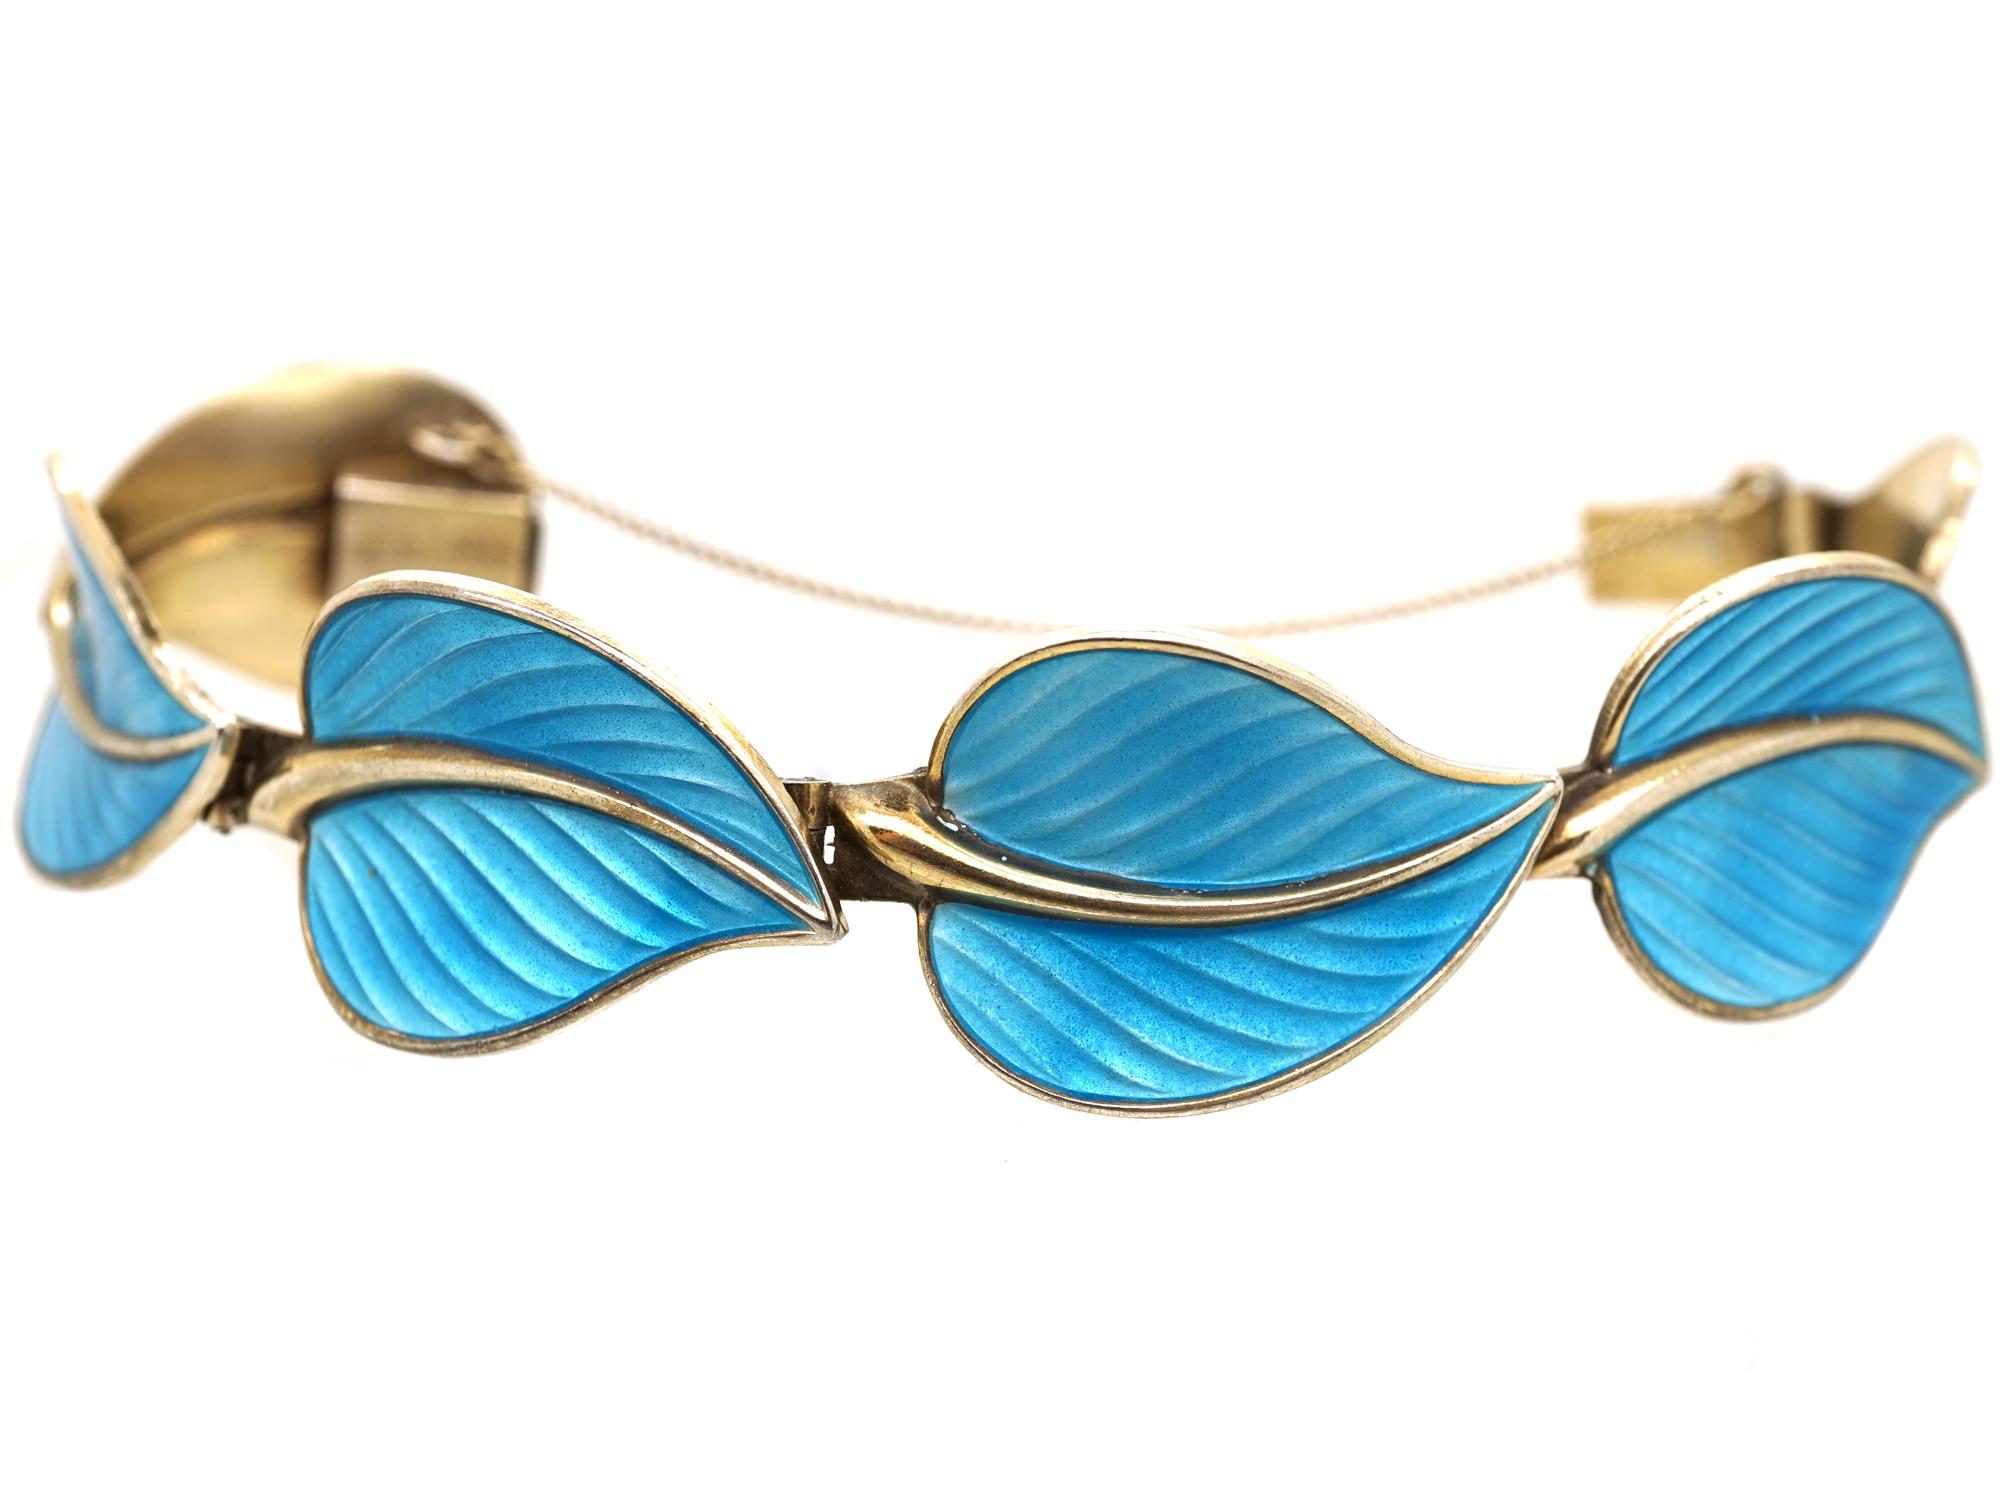 Silver Gilt & Blue Enamel Leaf Bracelet by Hans Myhre